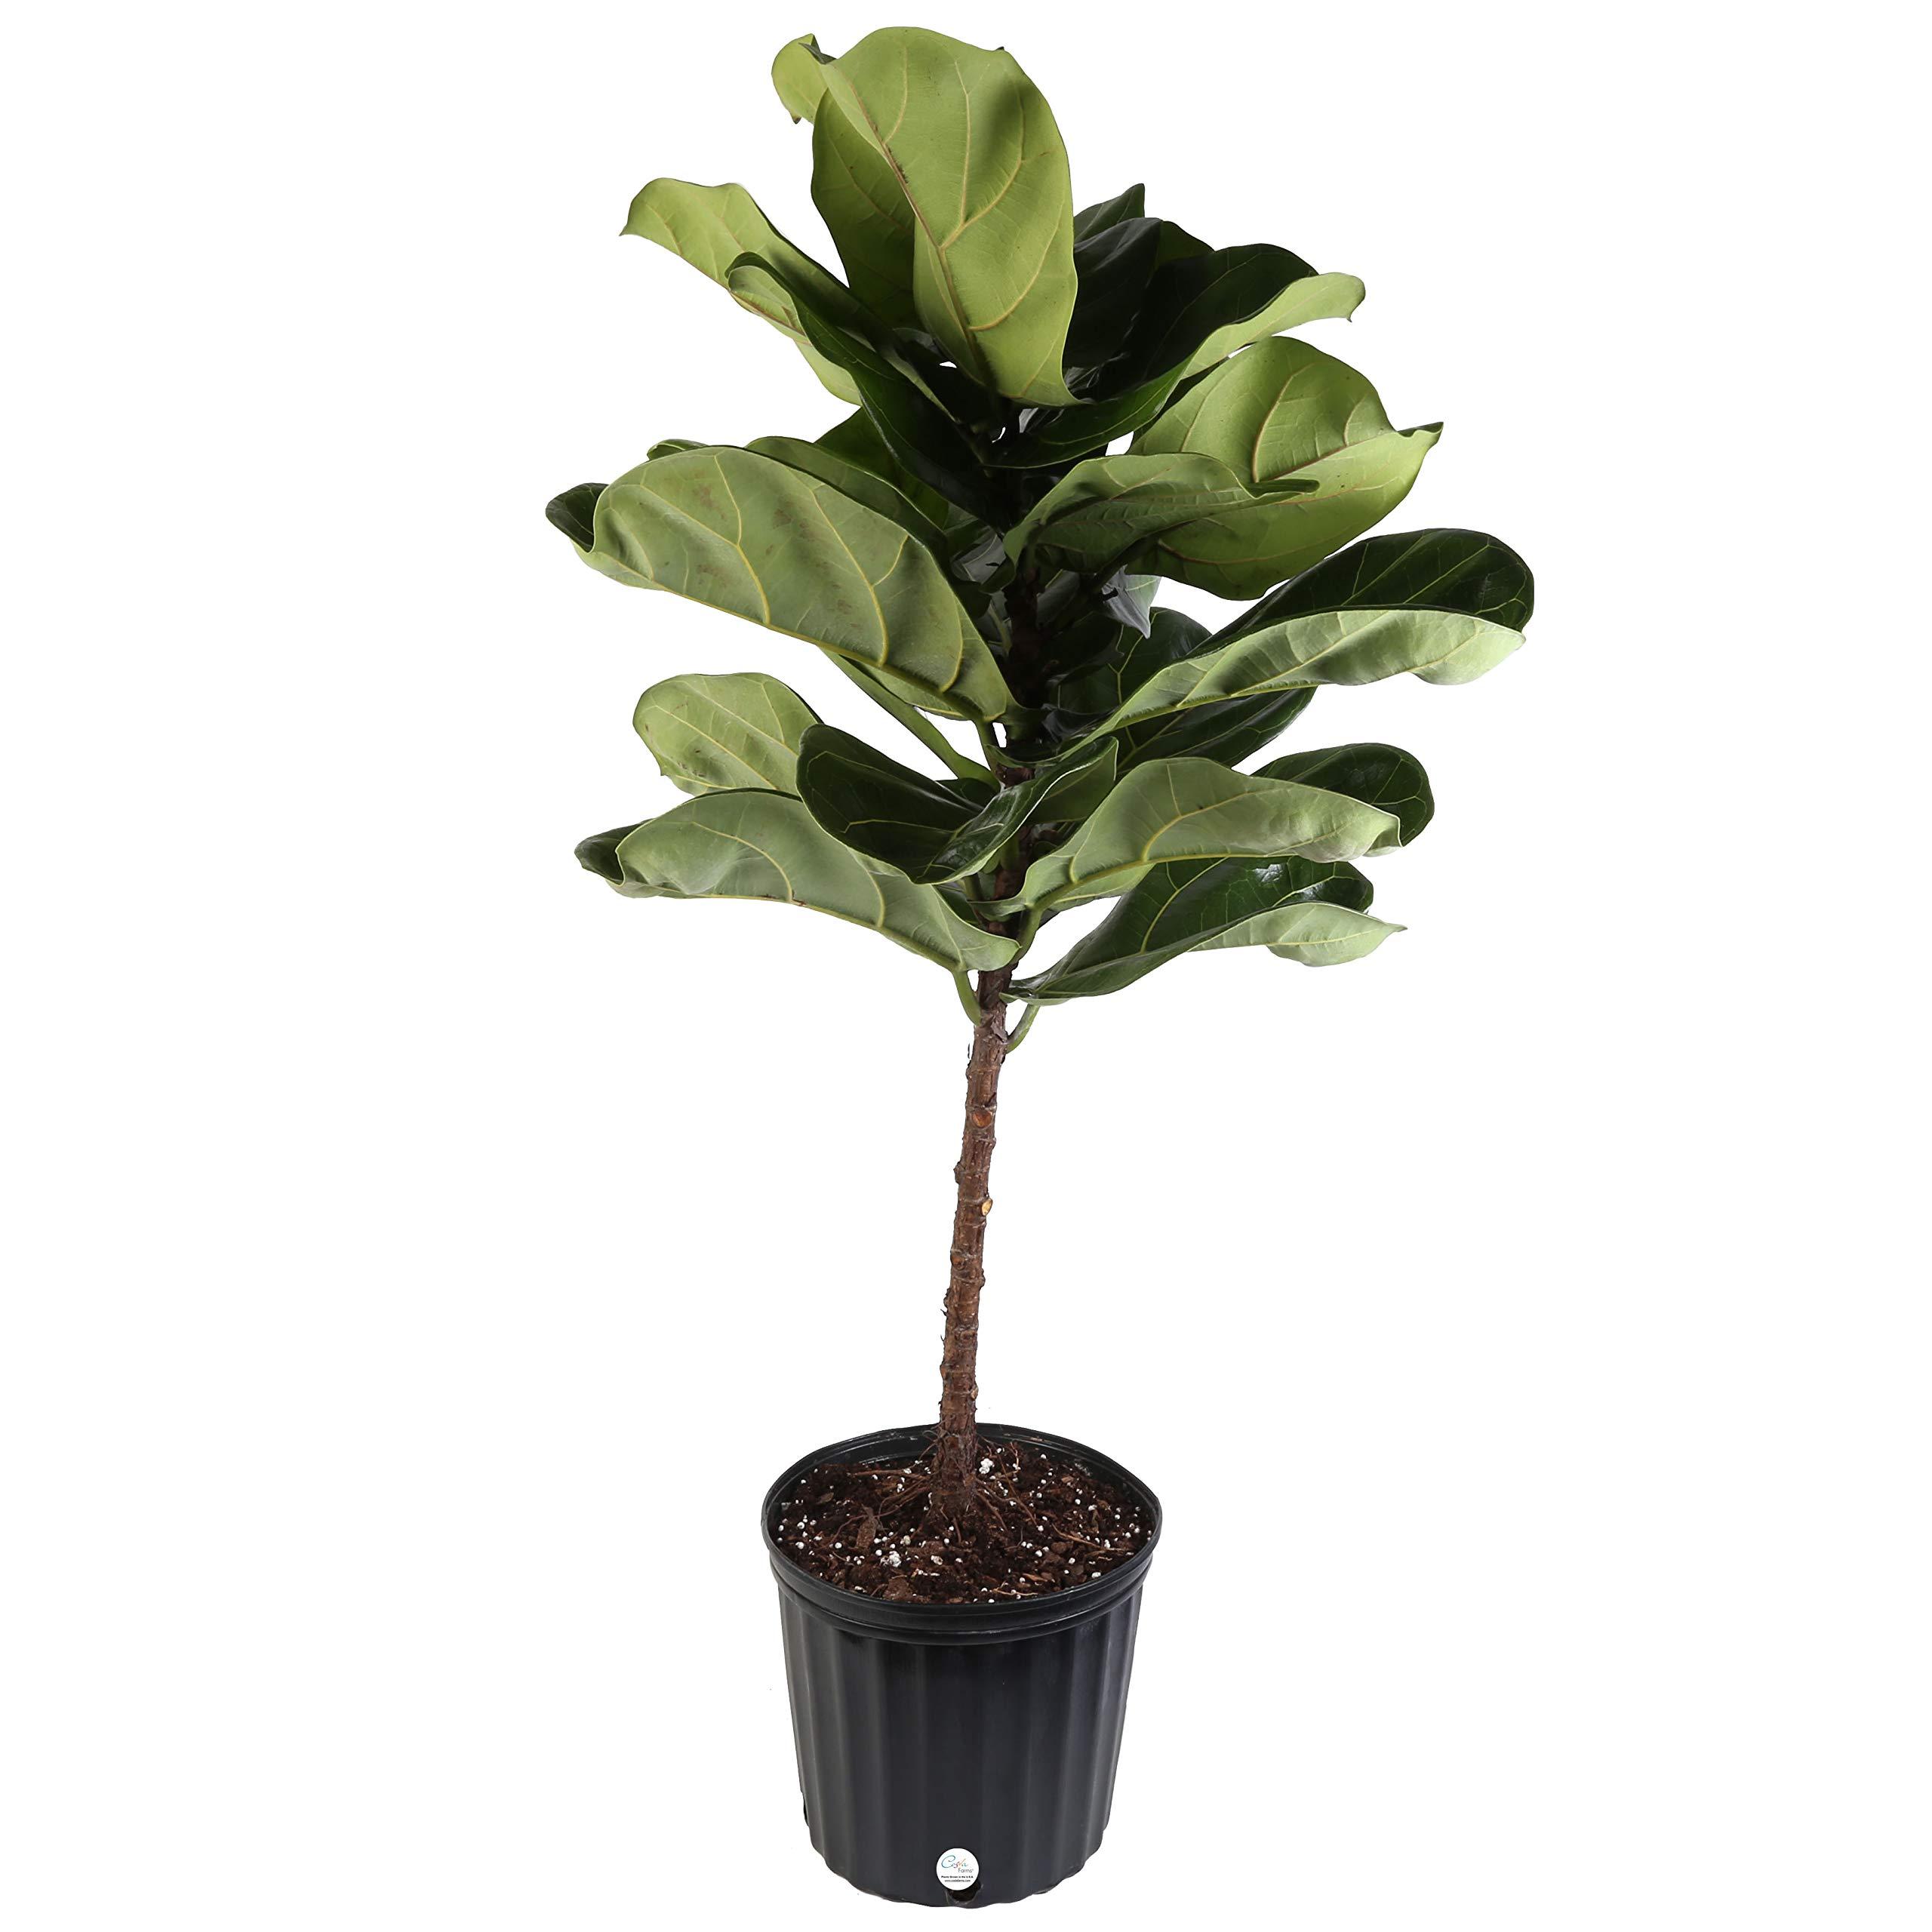 Costa Farms Live Ficus Lyrata, Fiddle-Leaf Fig, Indoor Tree - Floor Plant, 4-Feet Tall, Ships Fresh From Our Farm